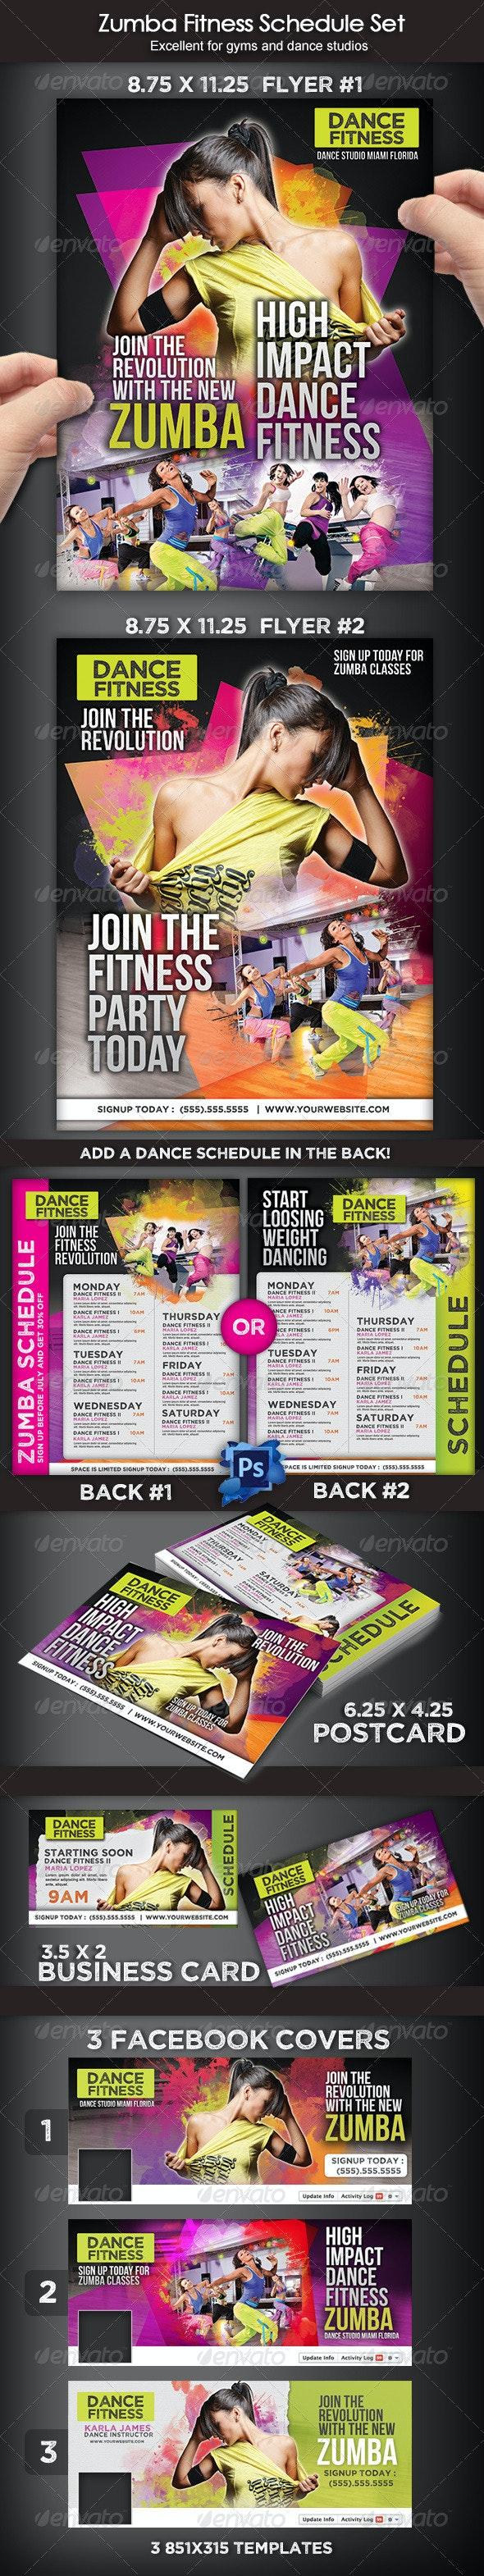 Zumba Dance Fitness Set - Print Templates